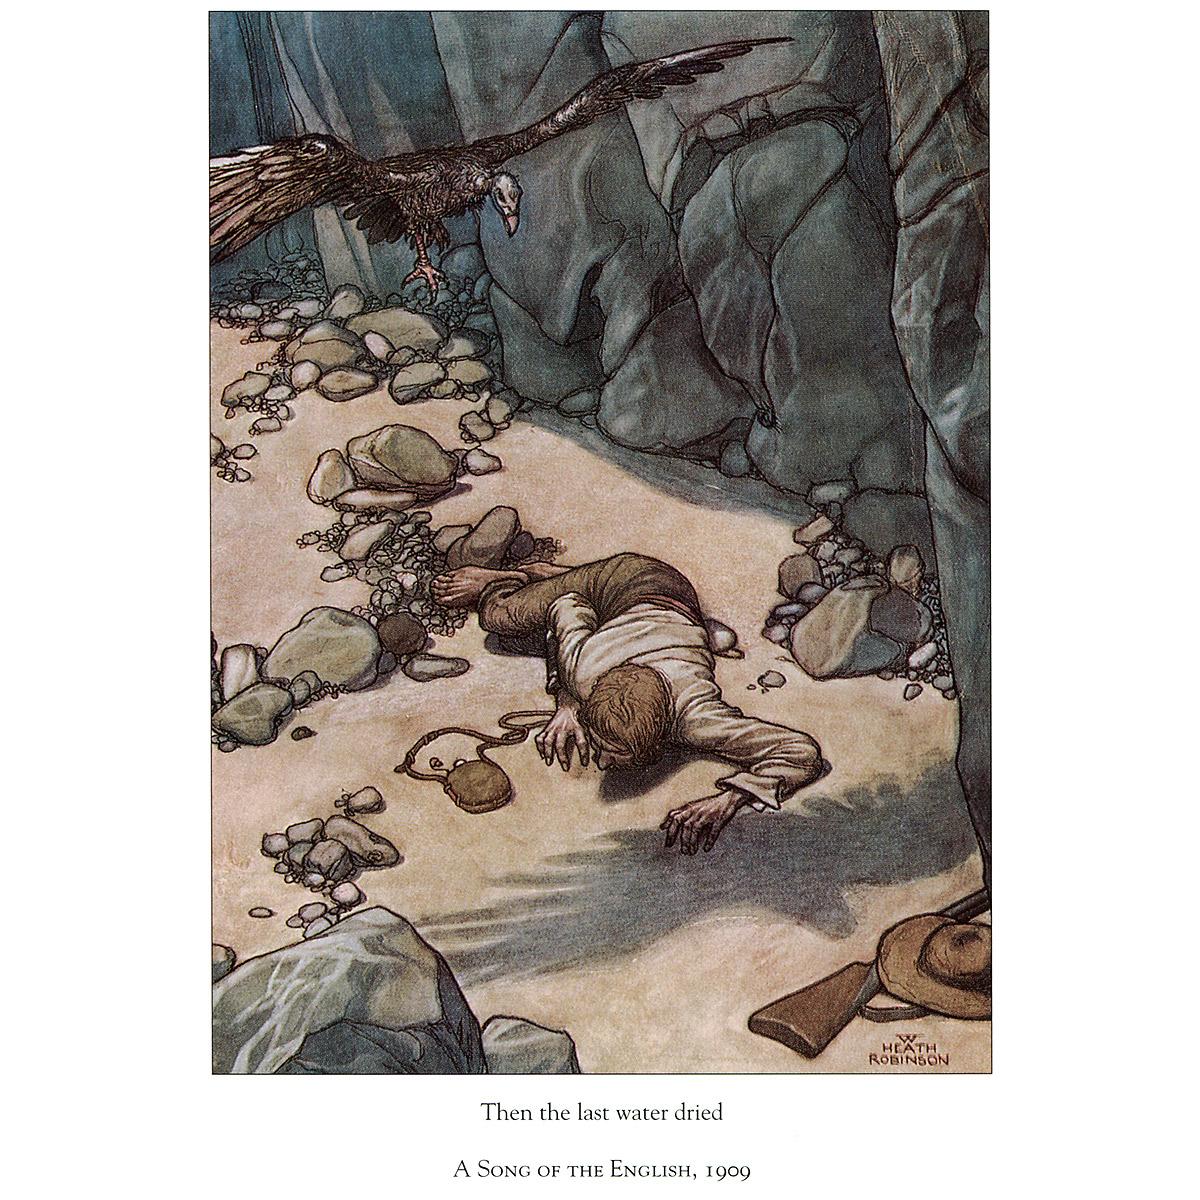 Golden Age Illustrations of W. Heath Robinson